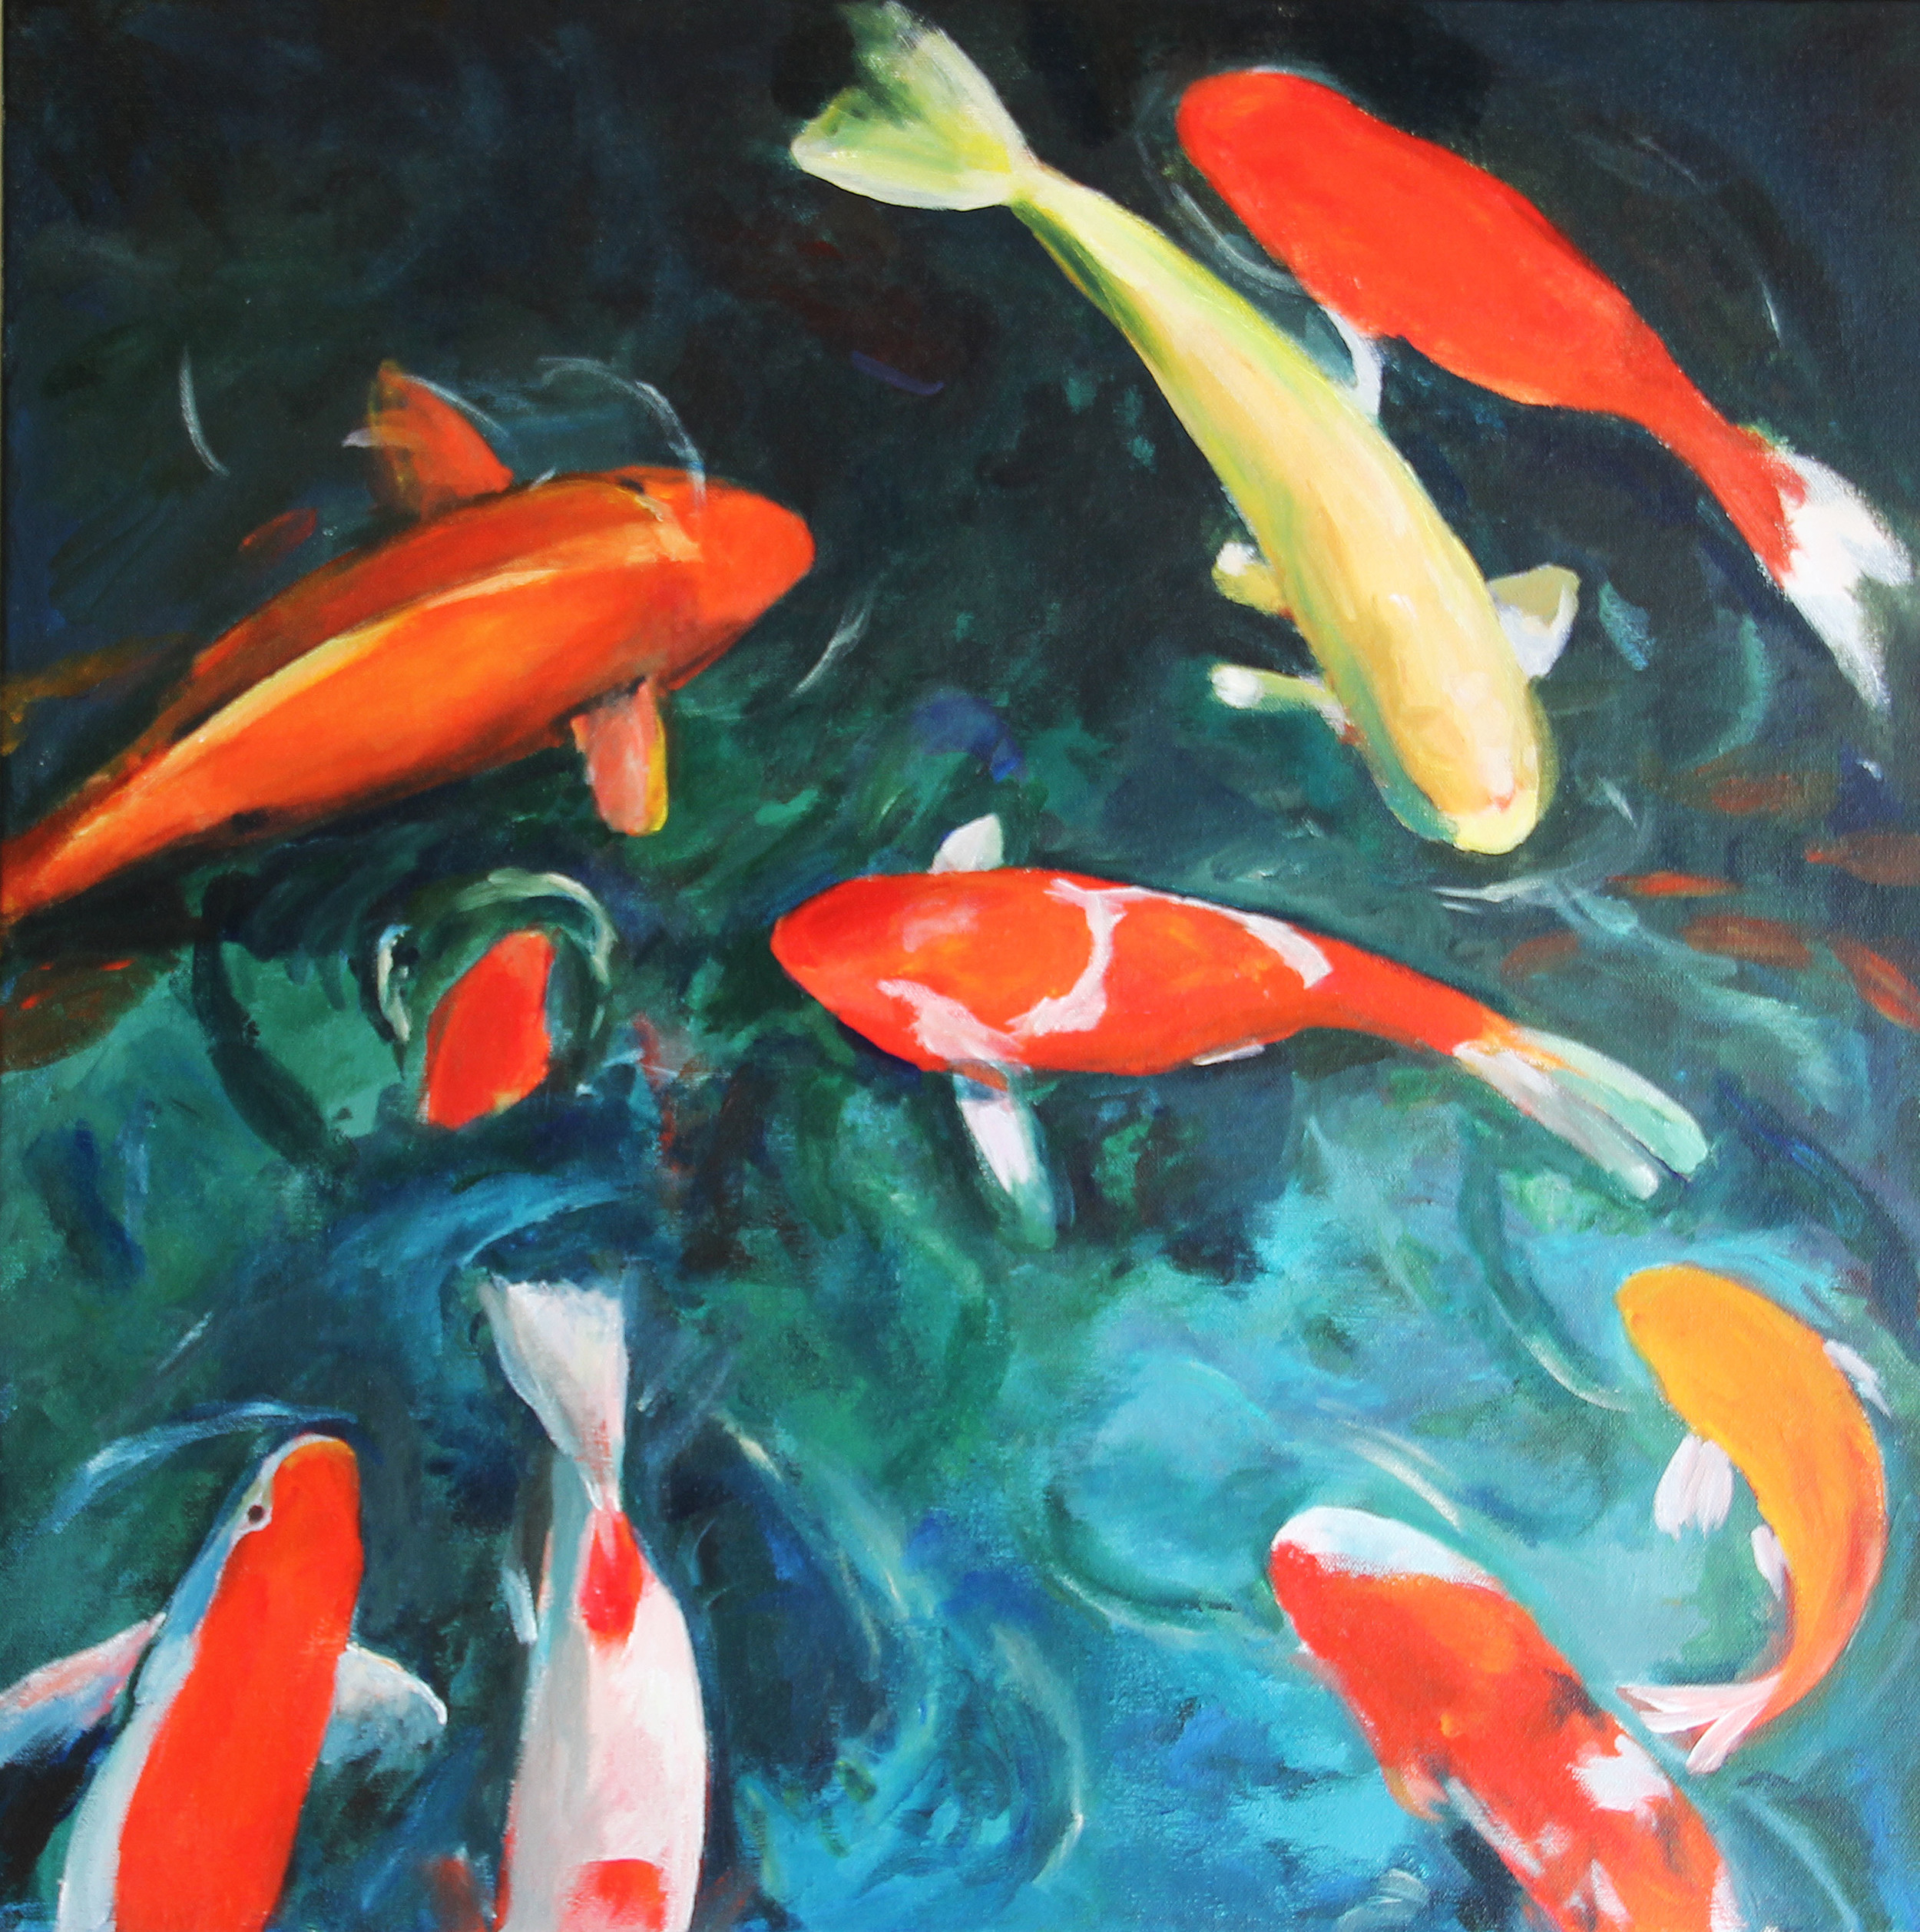 Helen Buck  Deep End of the Pool  24X24  Acrylic on Canvas